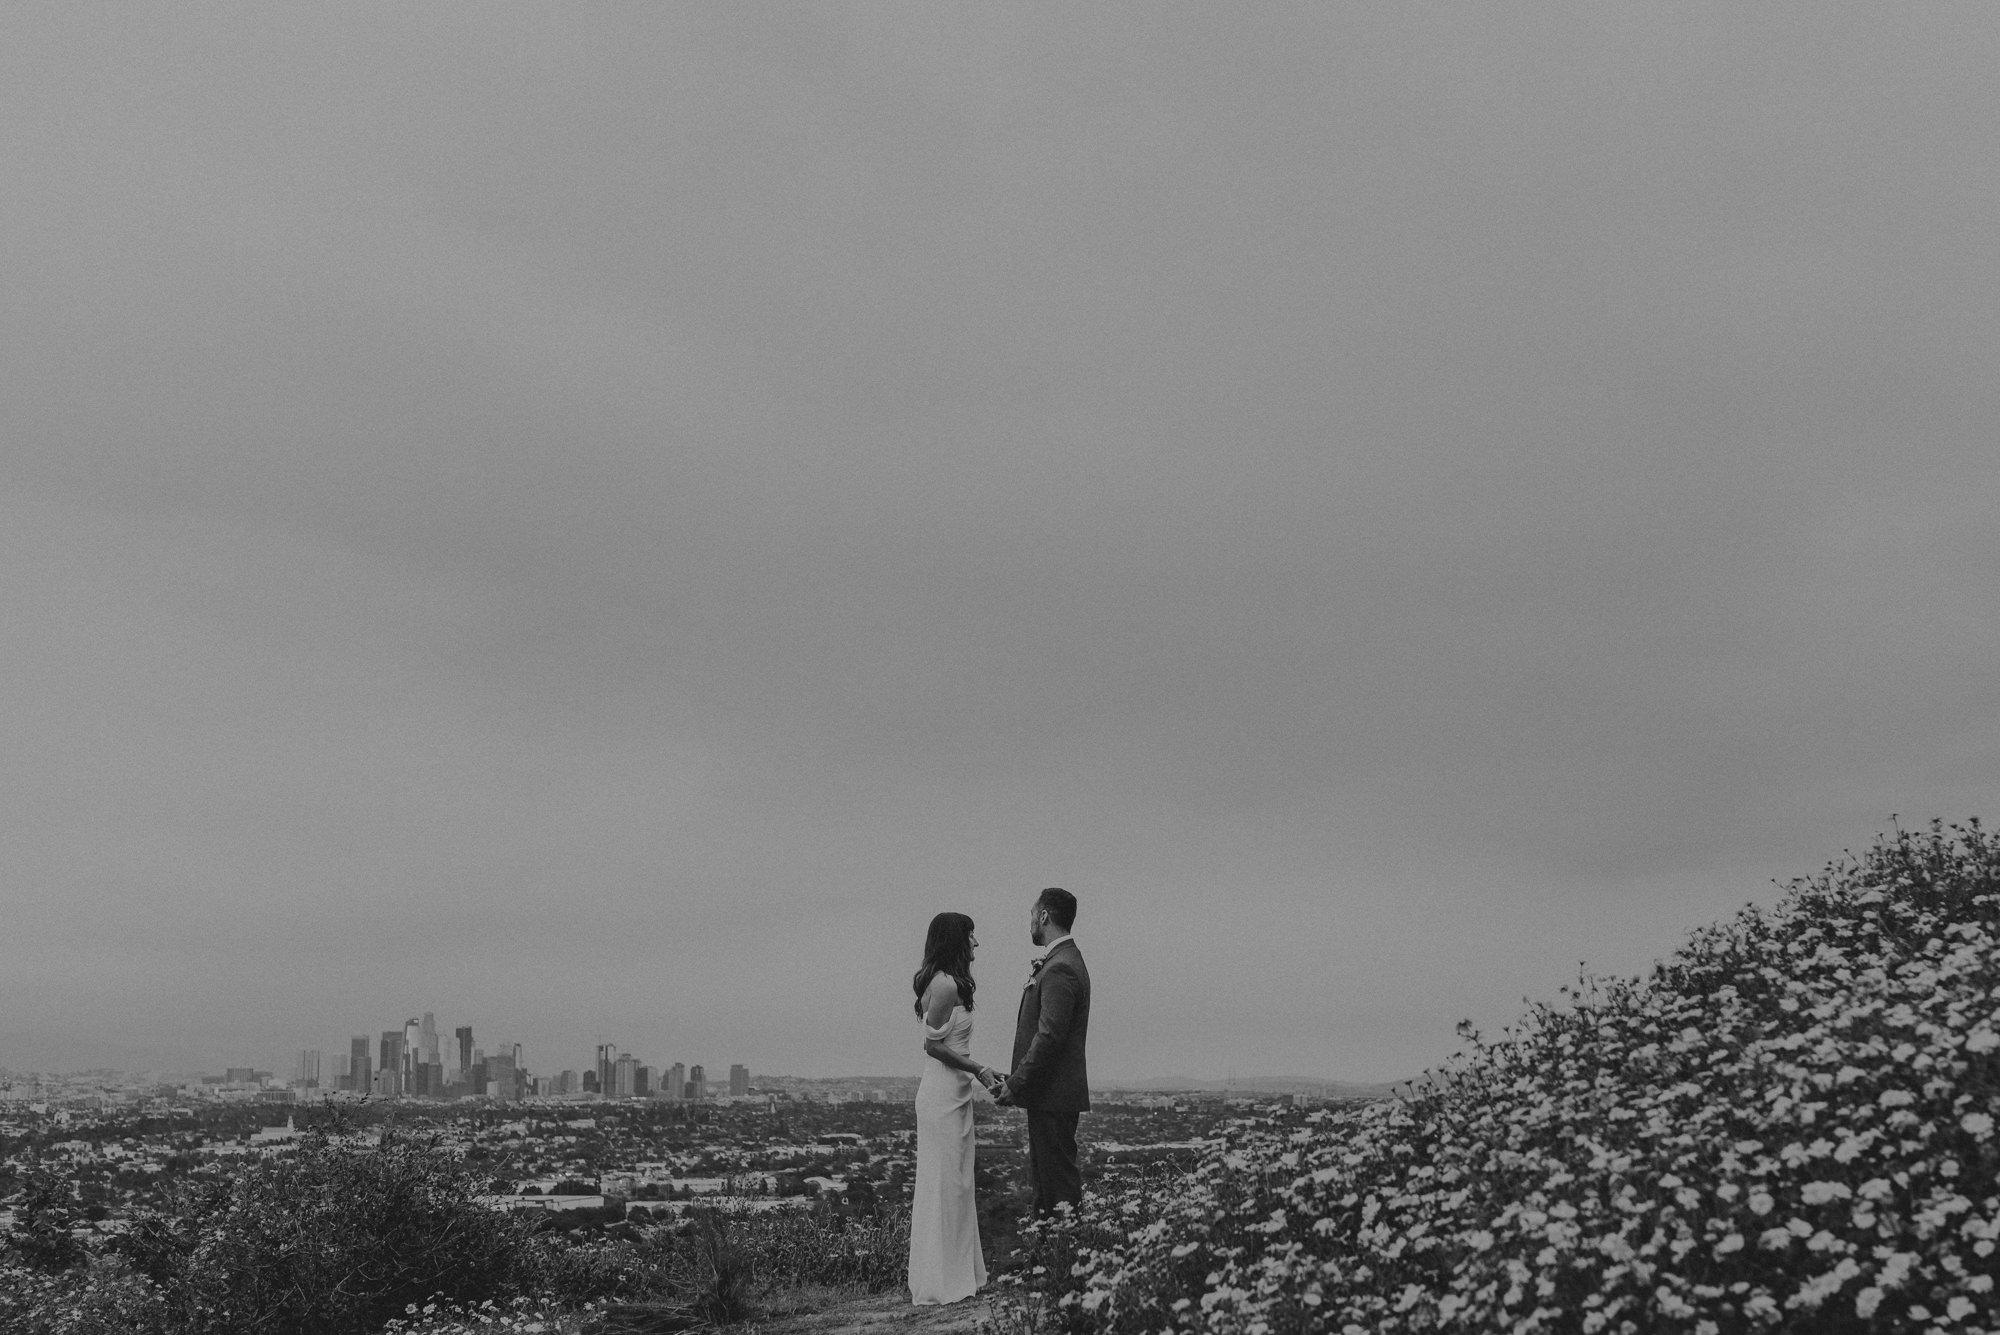 elopement photographer in los angeles - la wedding photographer - isaiahandtaylor.com-055.jpg